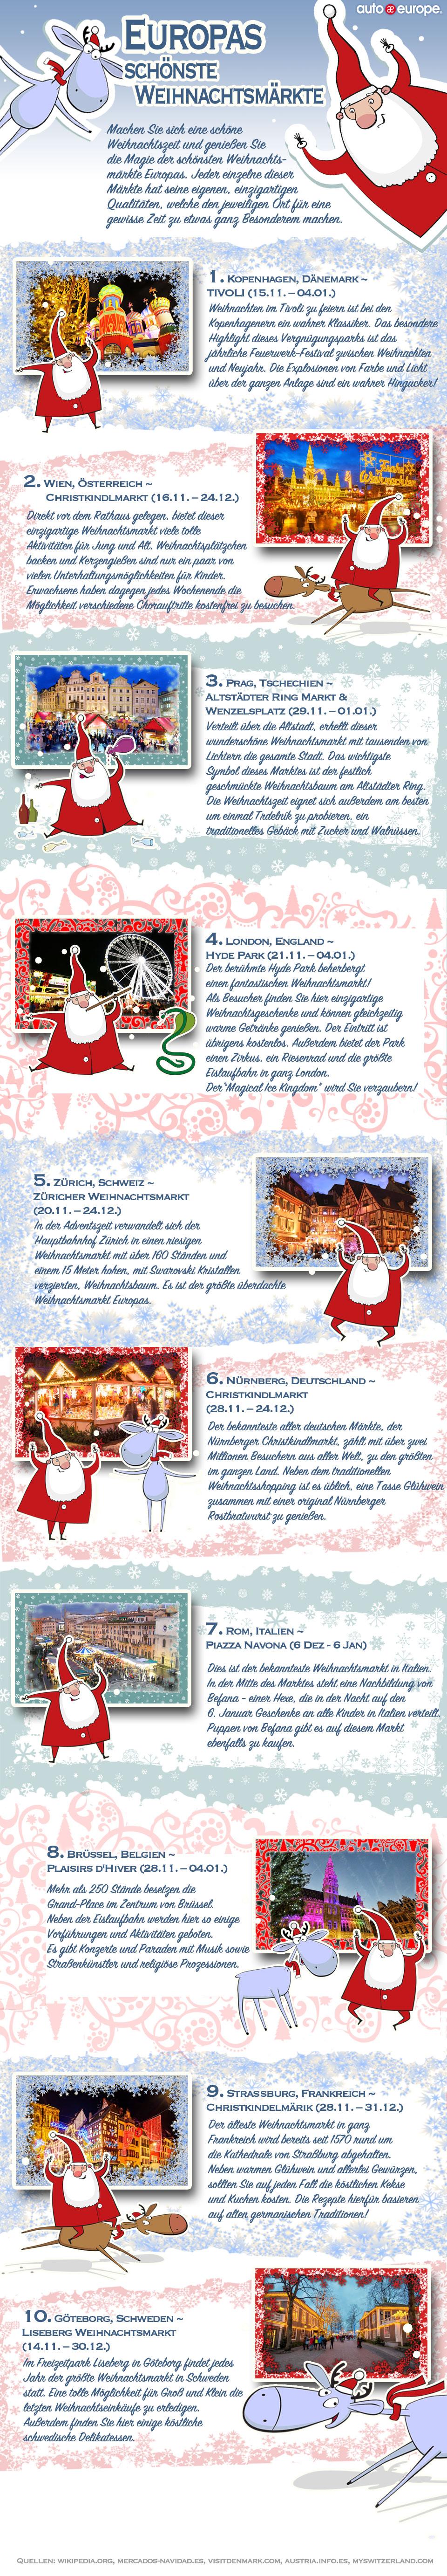 Weihnachtsmärkte in Europa